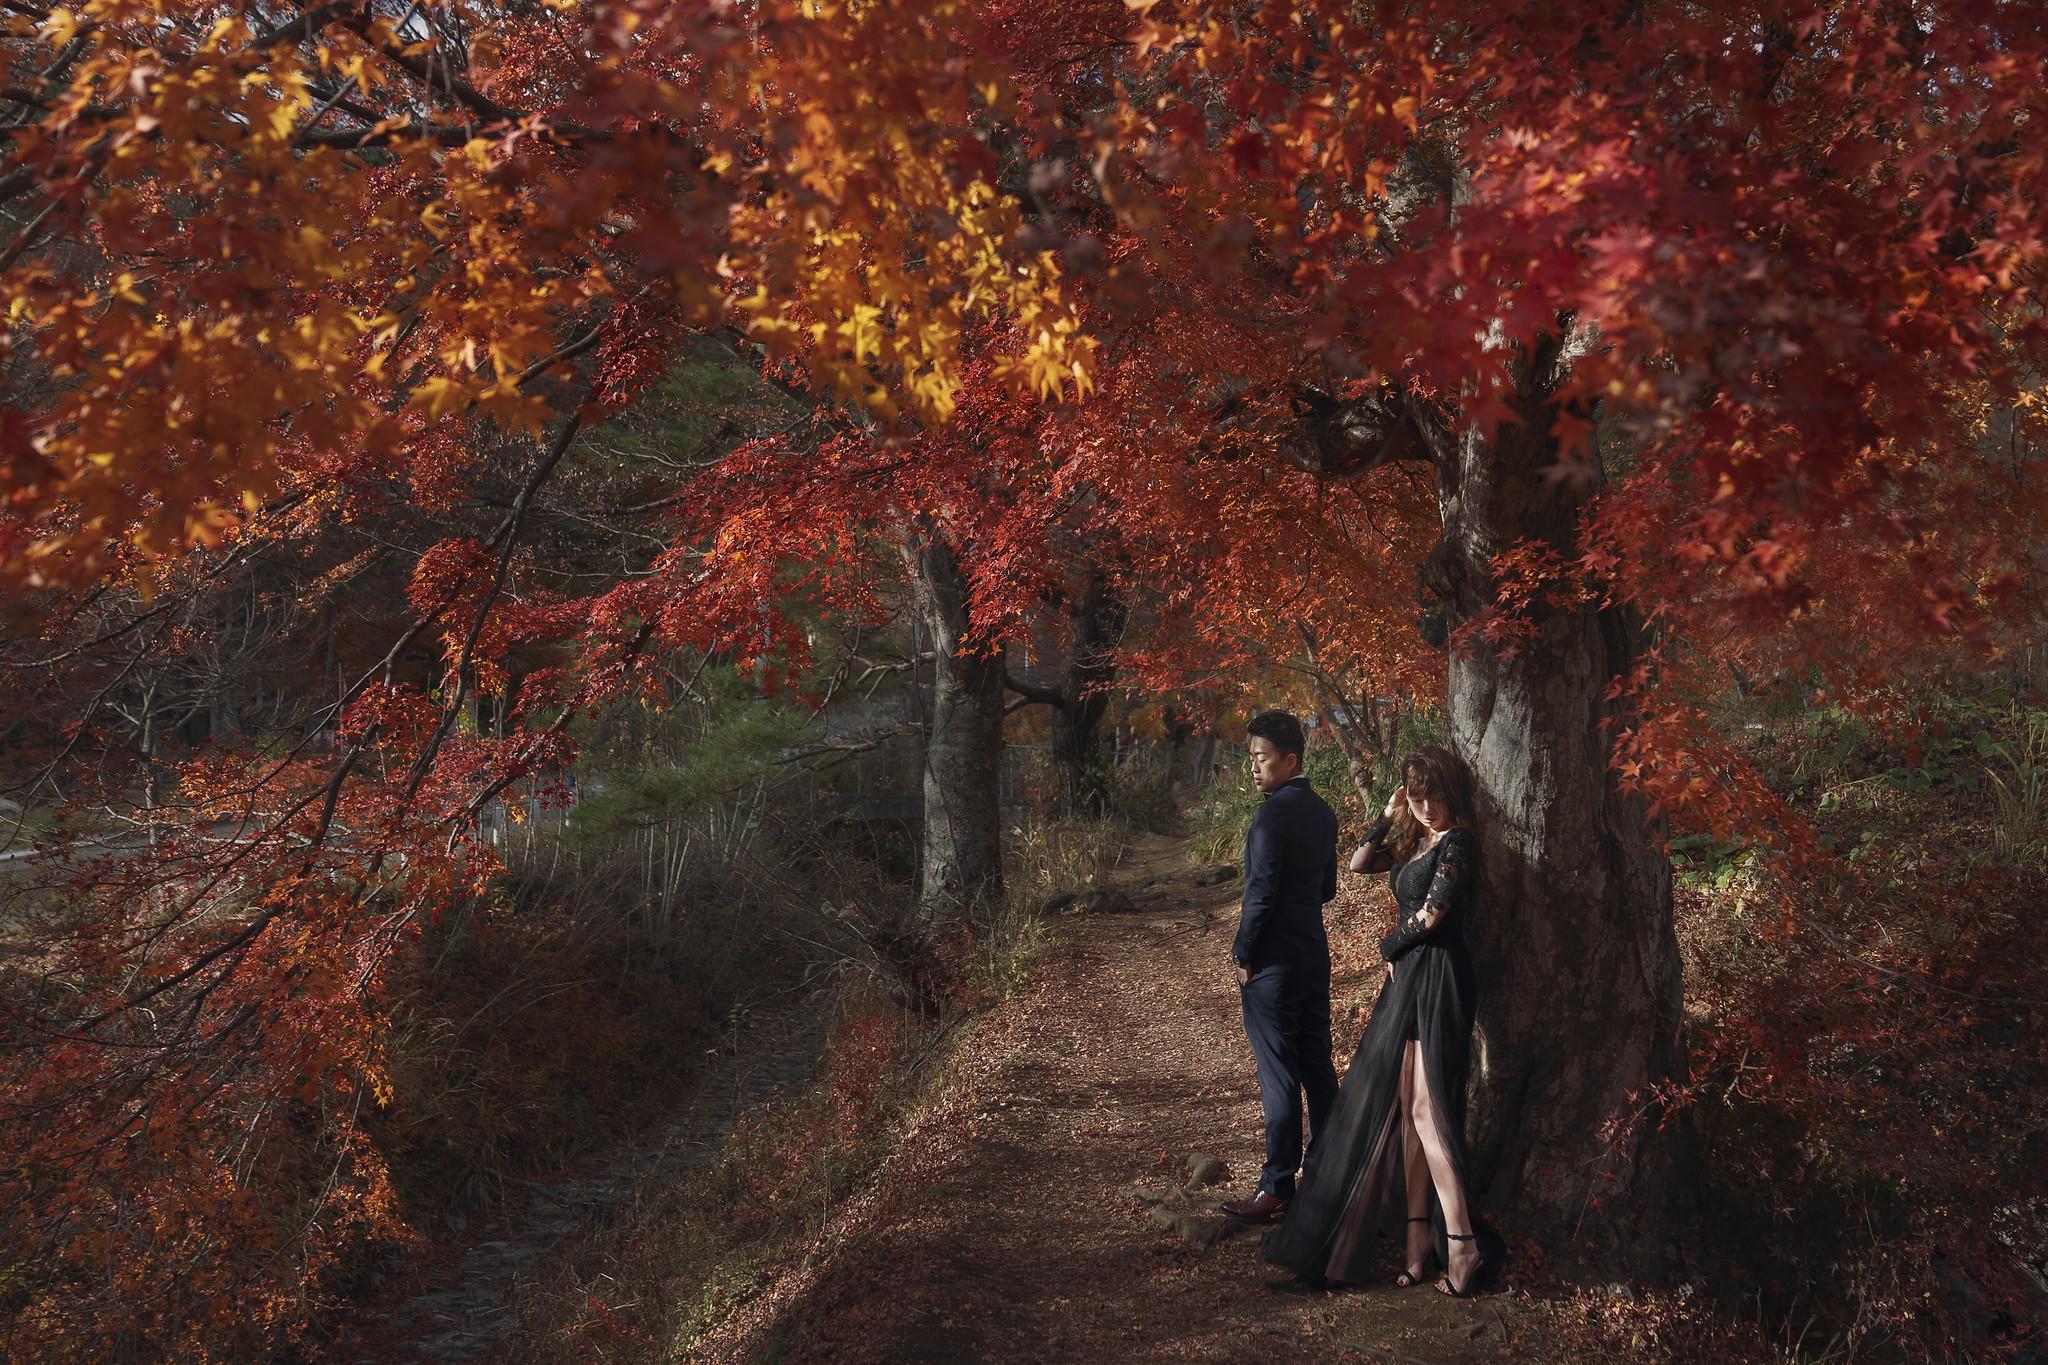 東京楓葉, 海外婚紗, EW, Donfer, EASTERN WEDDING, Tokyo Pre-Wedding, 楓葉婚紗